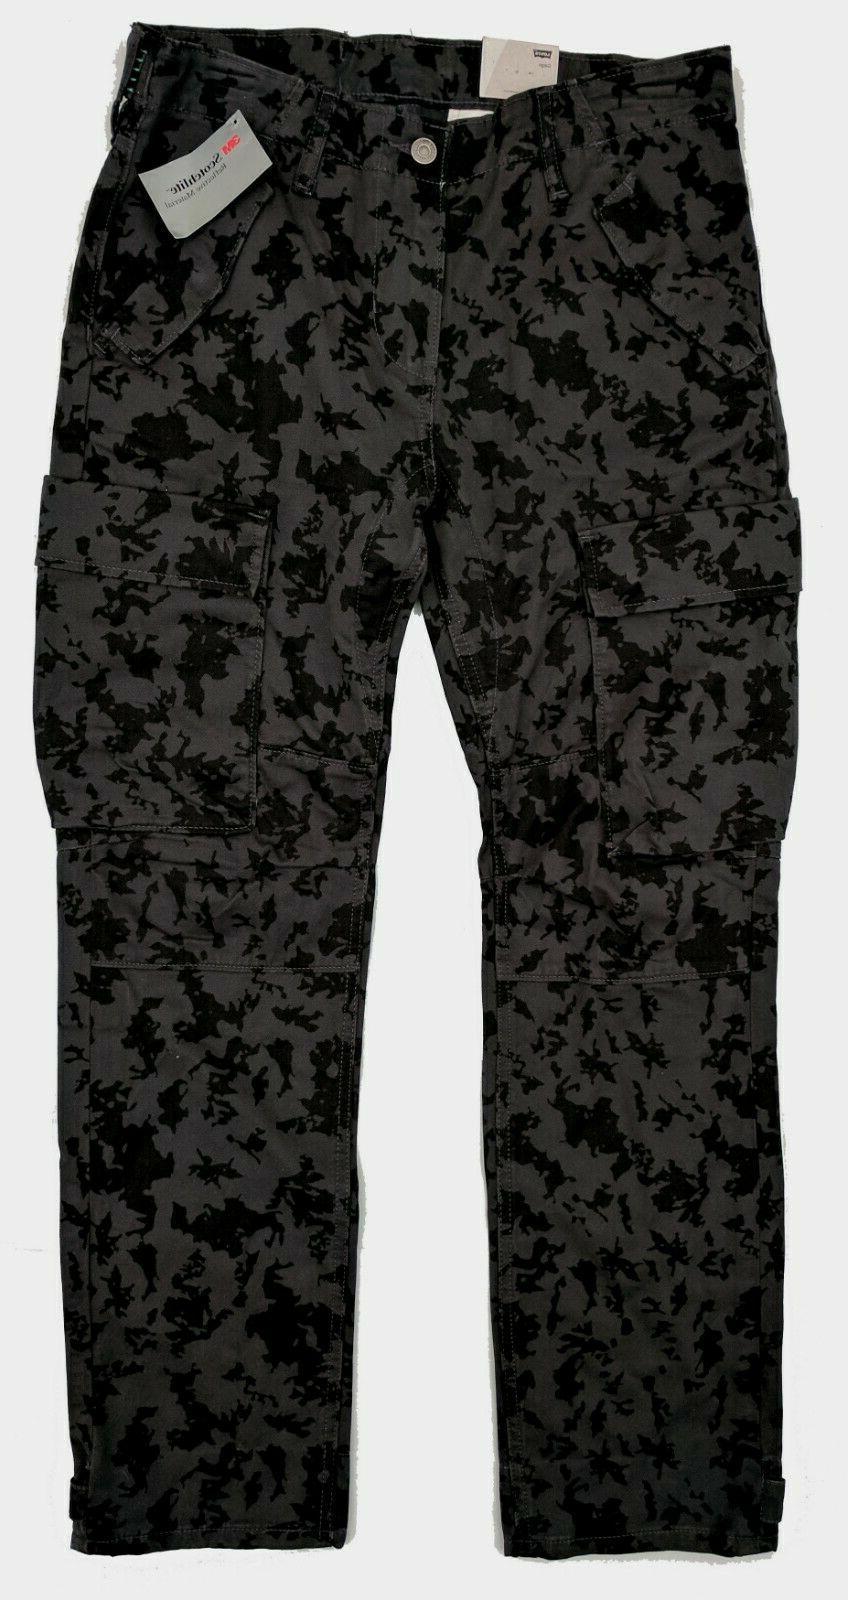 Levis Slim Cargo Pants Men's Camo Reflective #0012